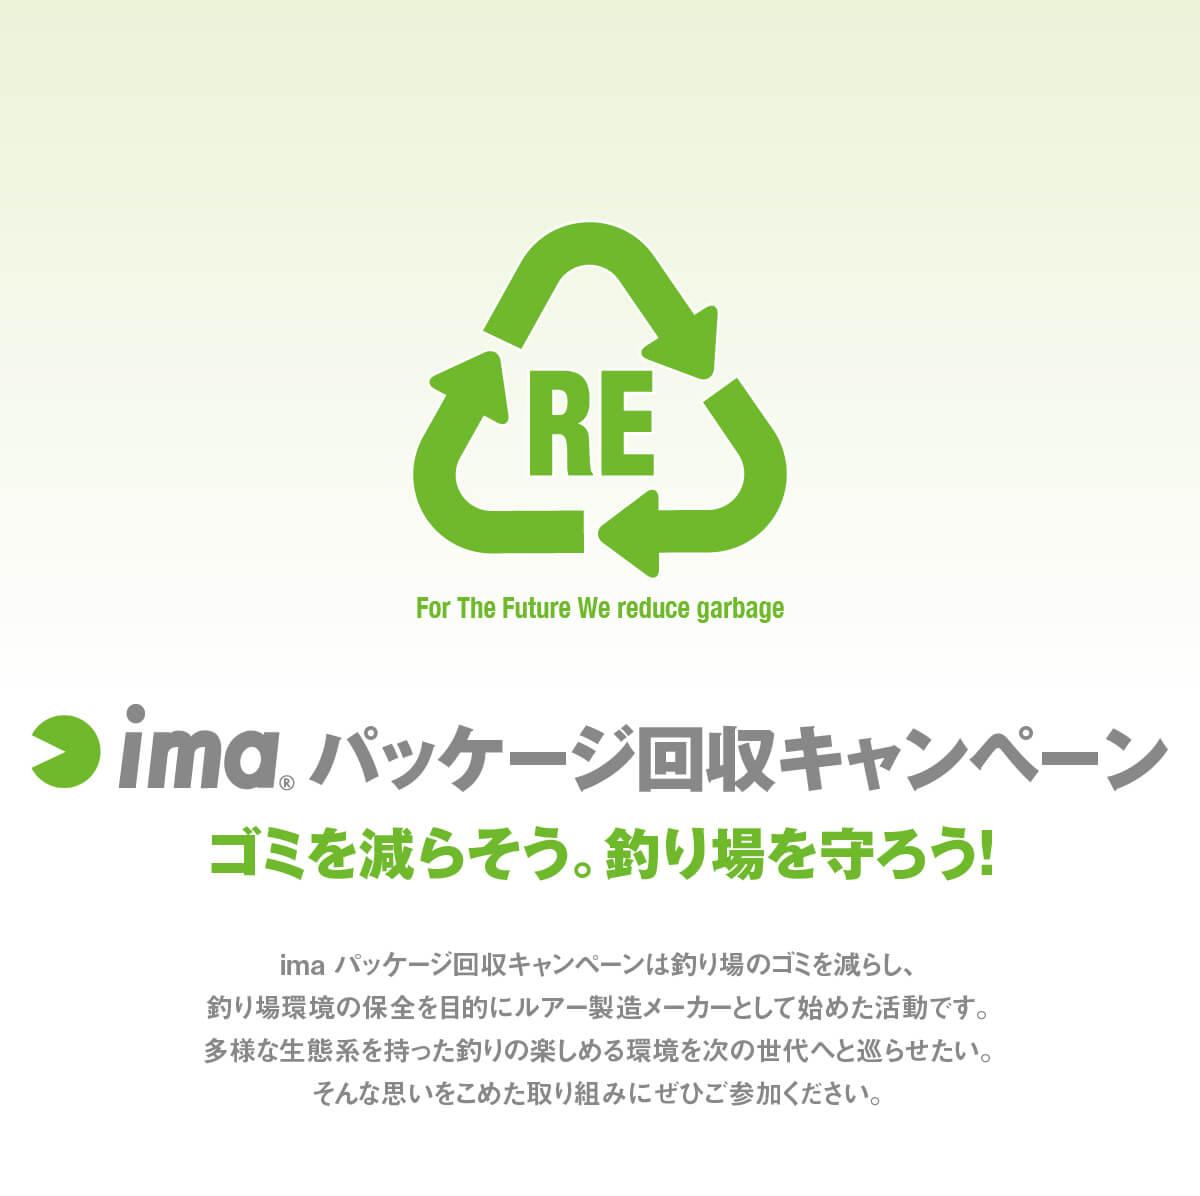 imaパッケージ回収キャンペーン